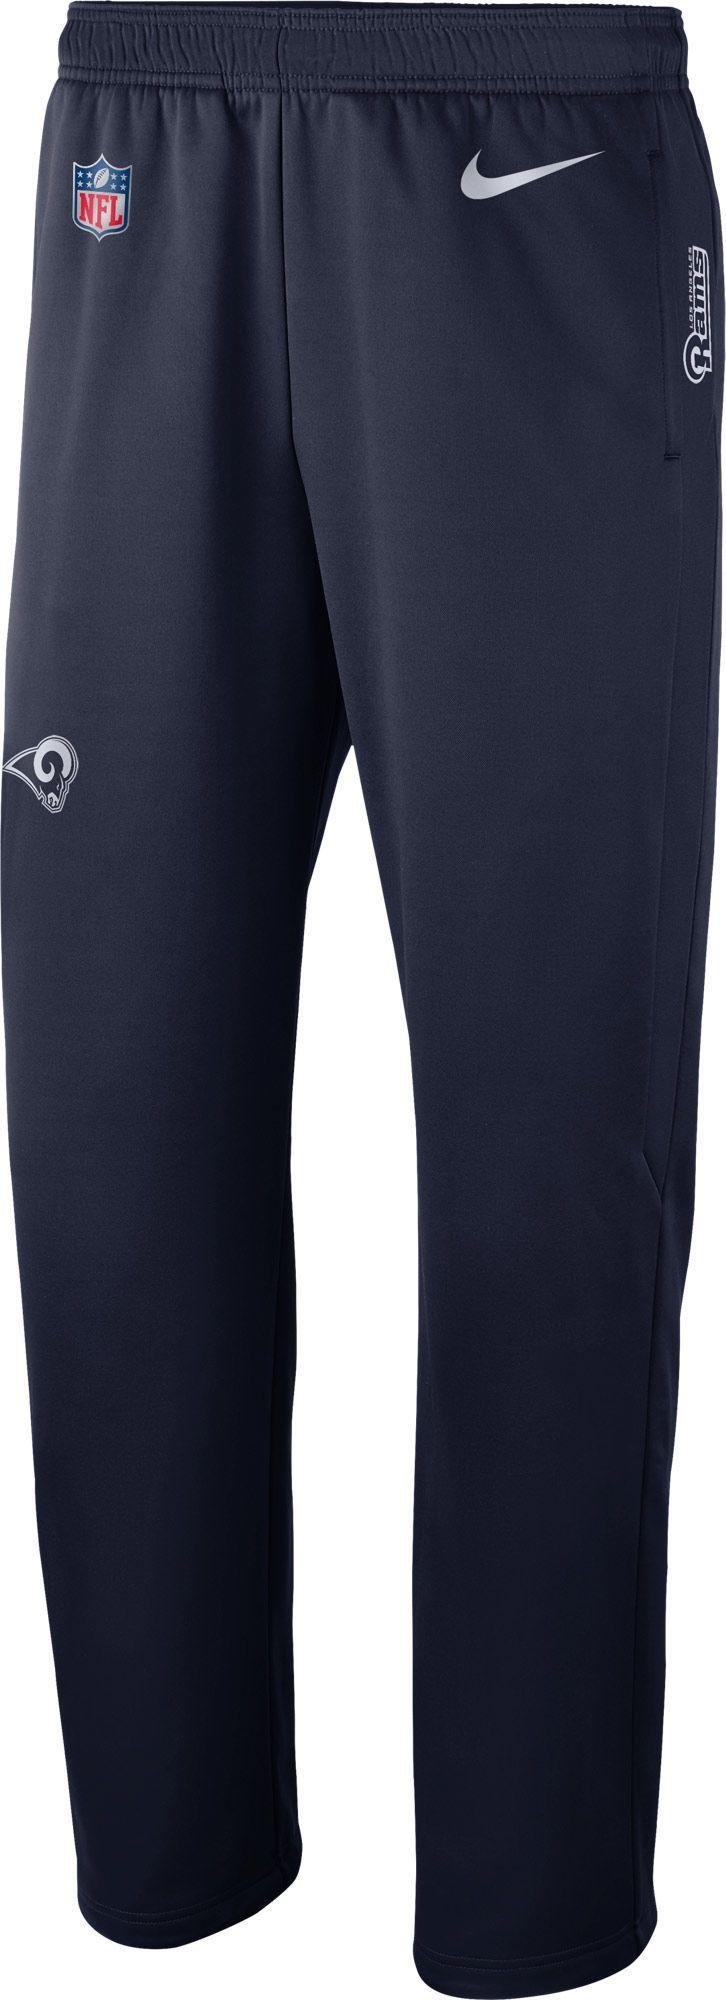 7b6fedf6387e Nike Men s Los Angeles Sideline Therma-FIT Navy Performance Pants ...